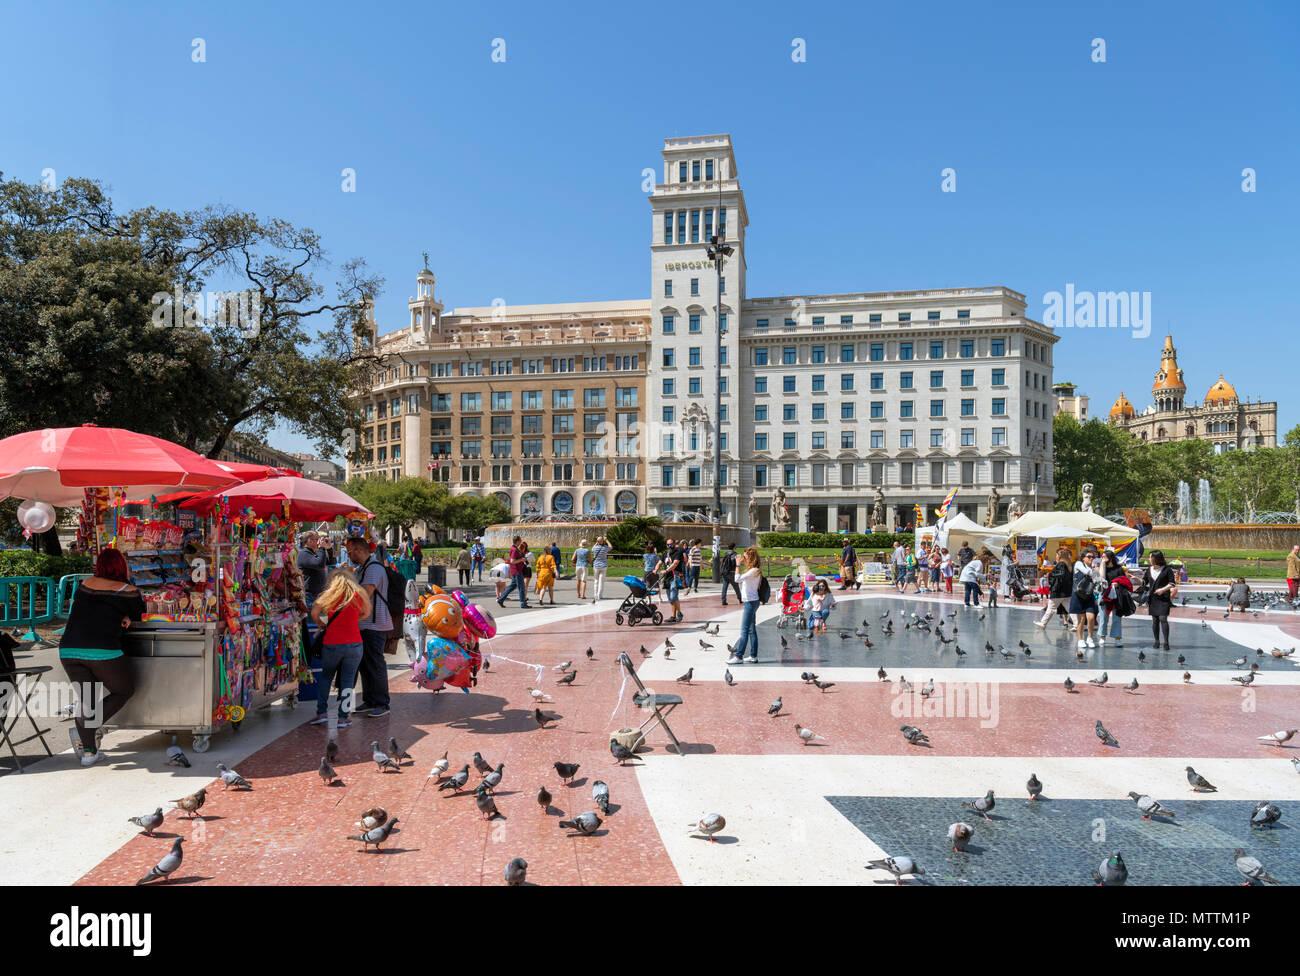 Placa de Catalunya, Barcelone, Espagne Photo Stock